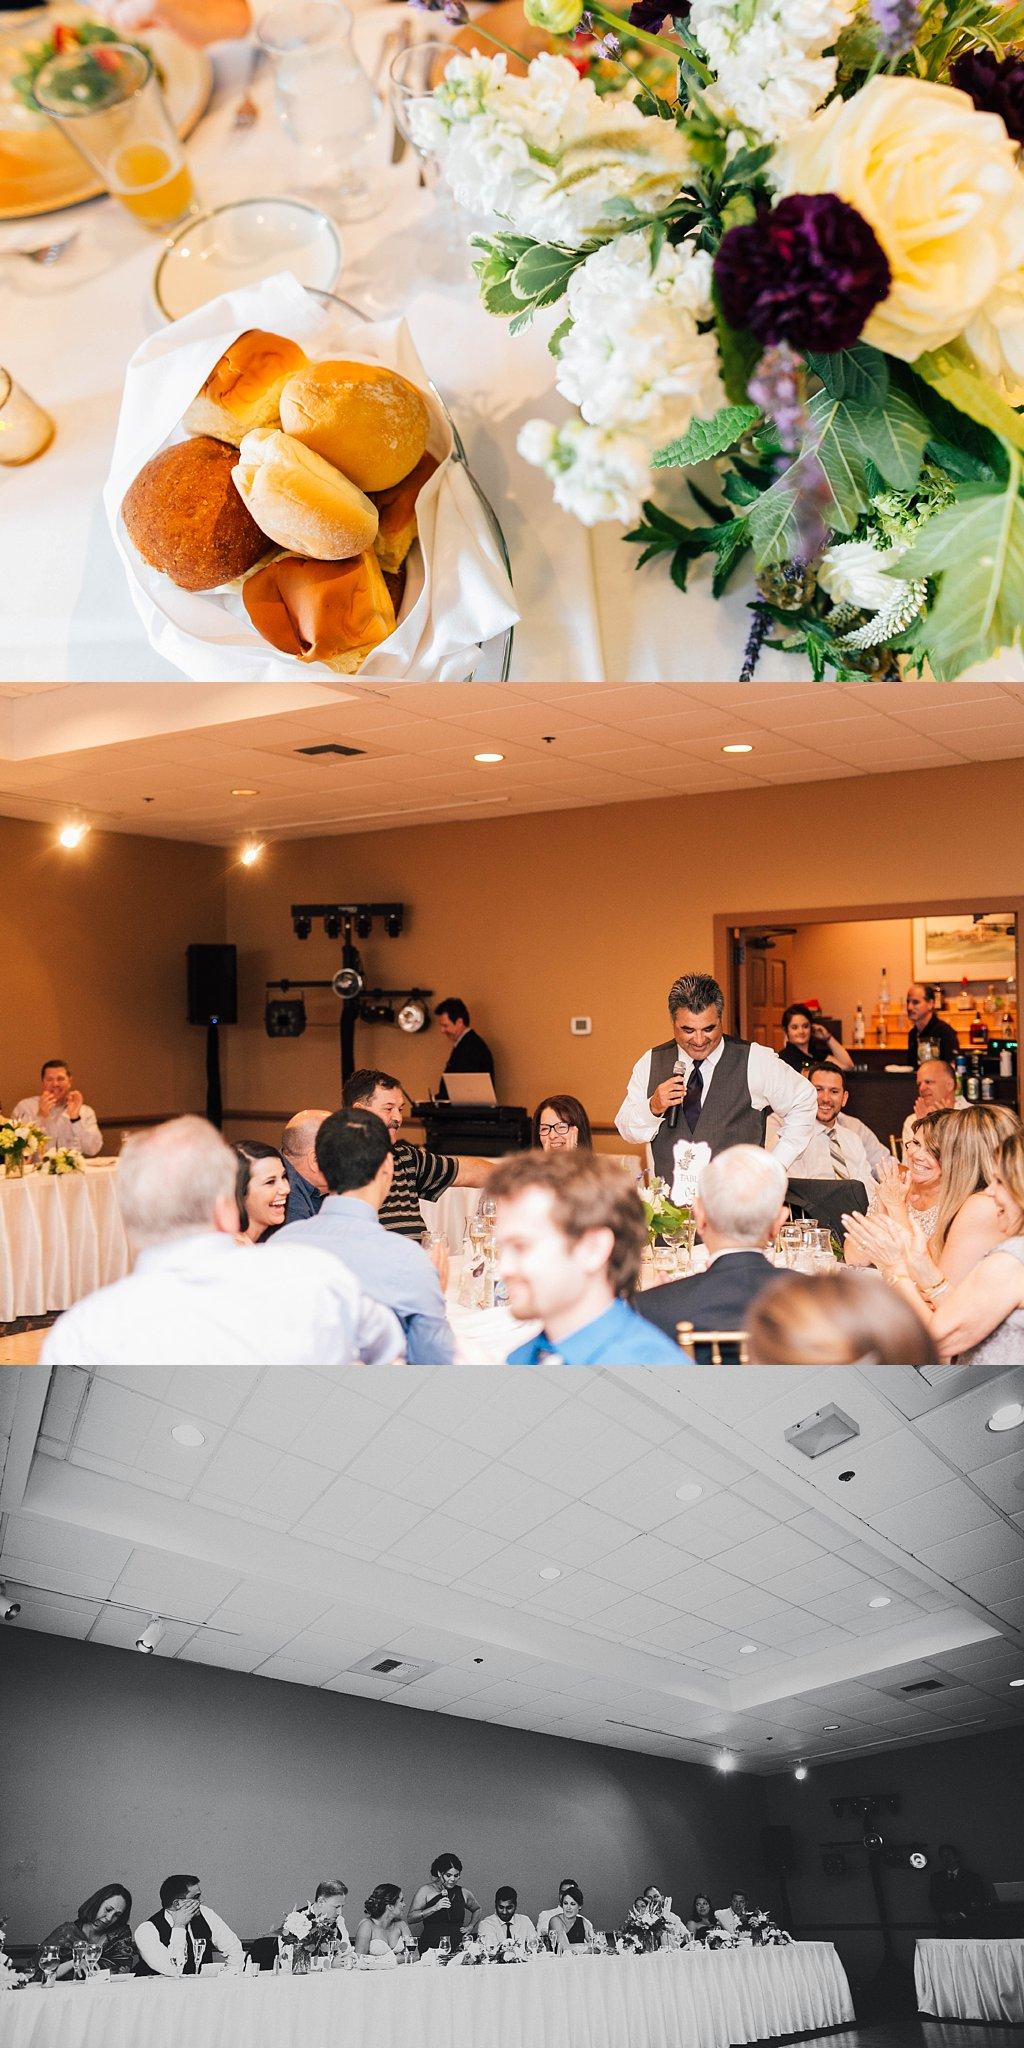 ashley_vos_seattle_wedding_photographer_0099.jpg